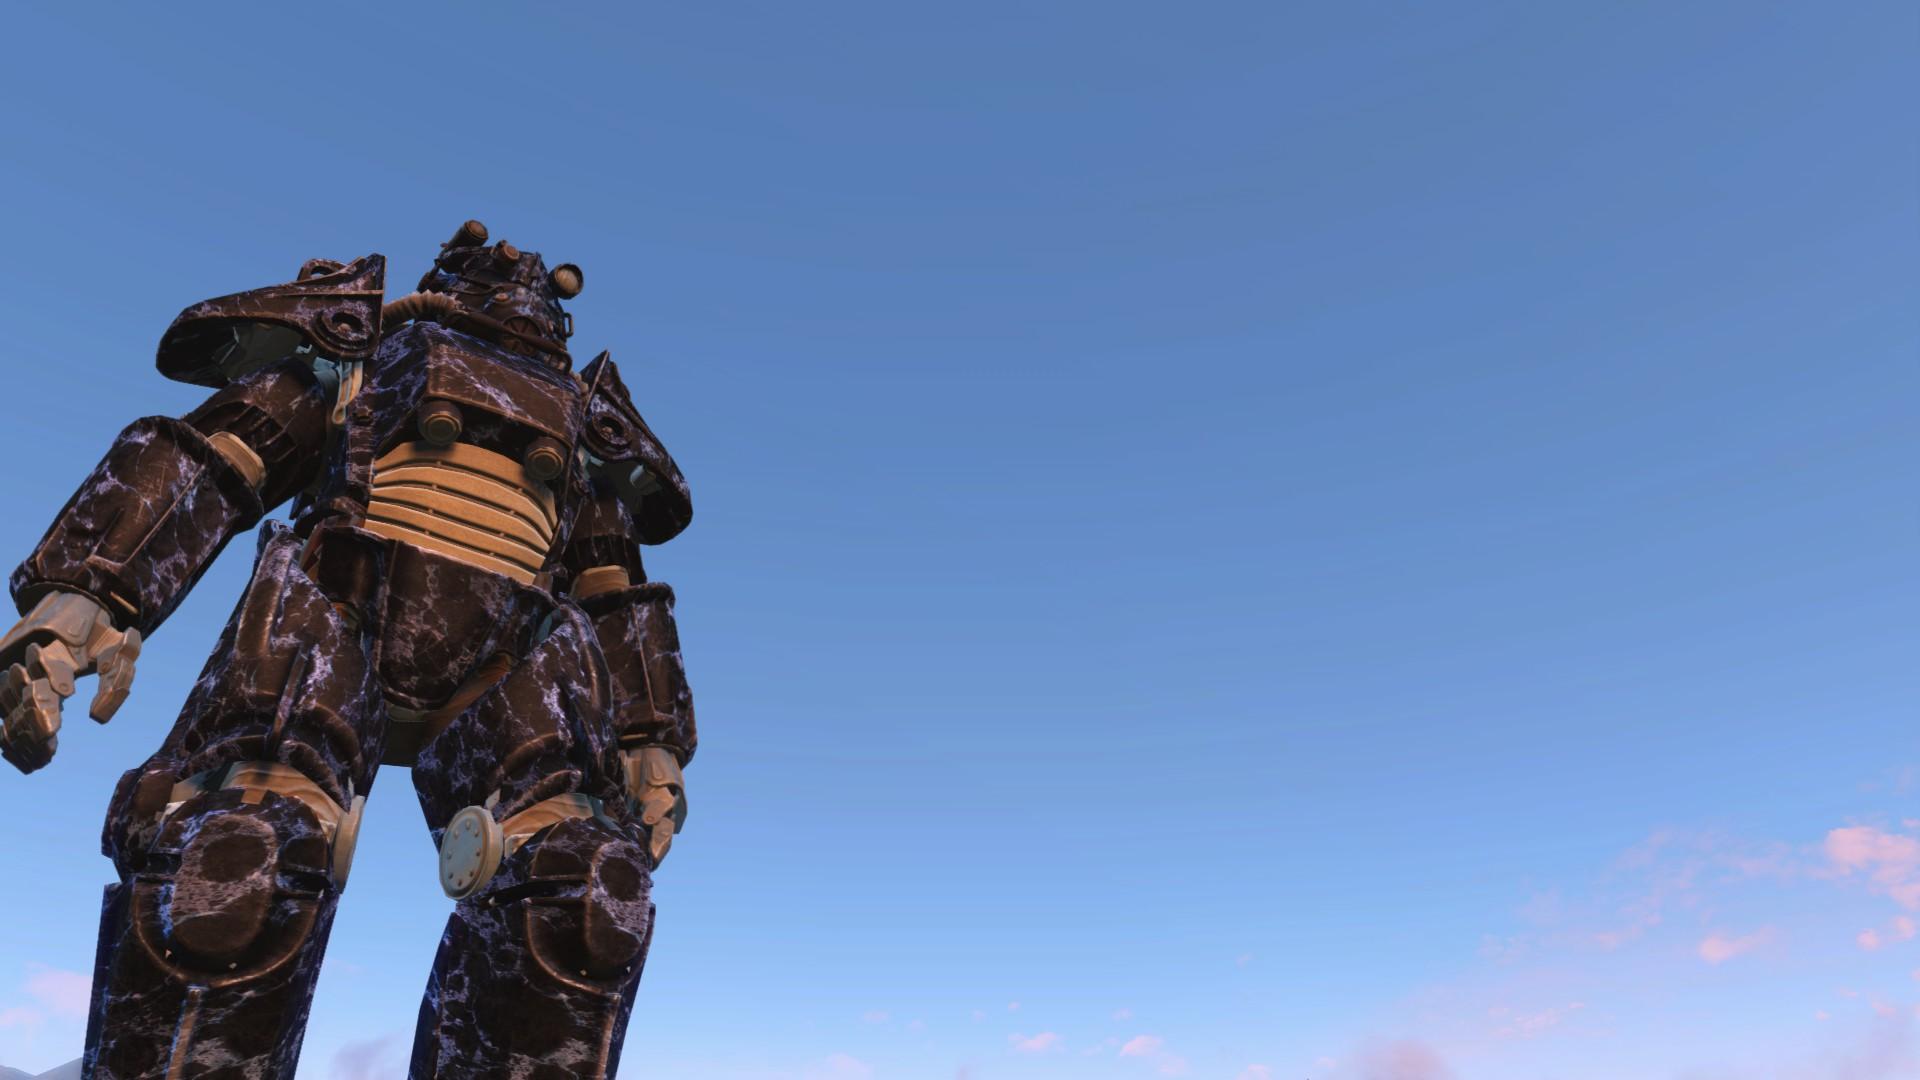 20190420215426_1.jpg - Fallout 4